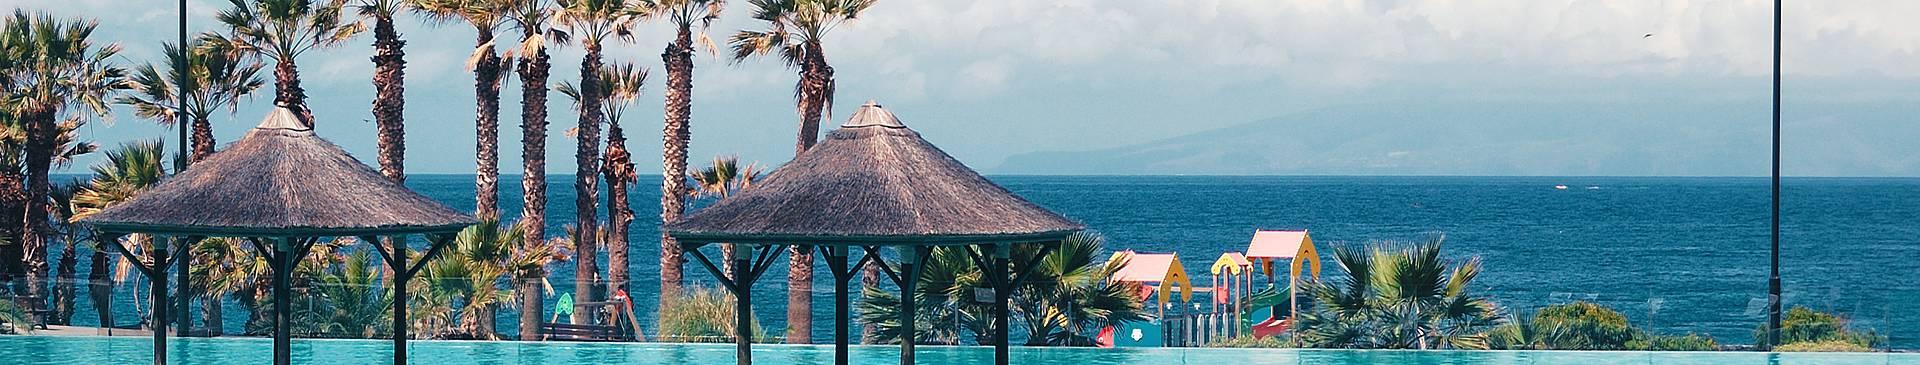 Luxury holidays in Spain